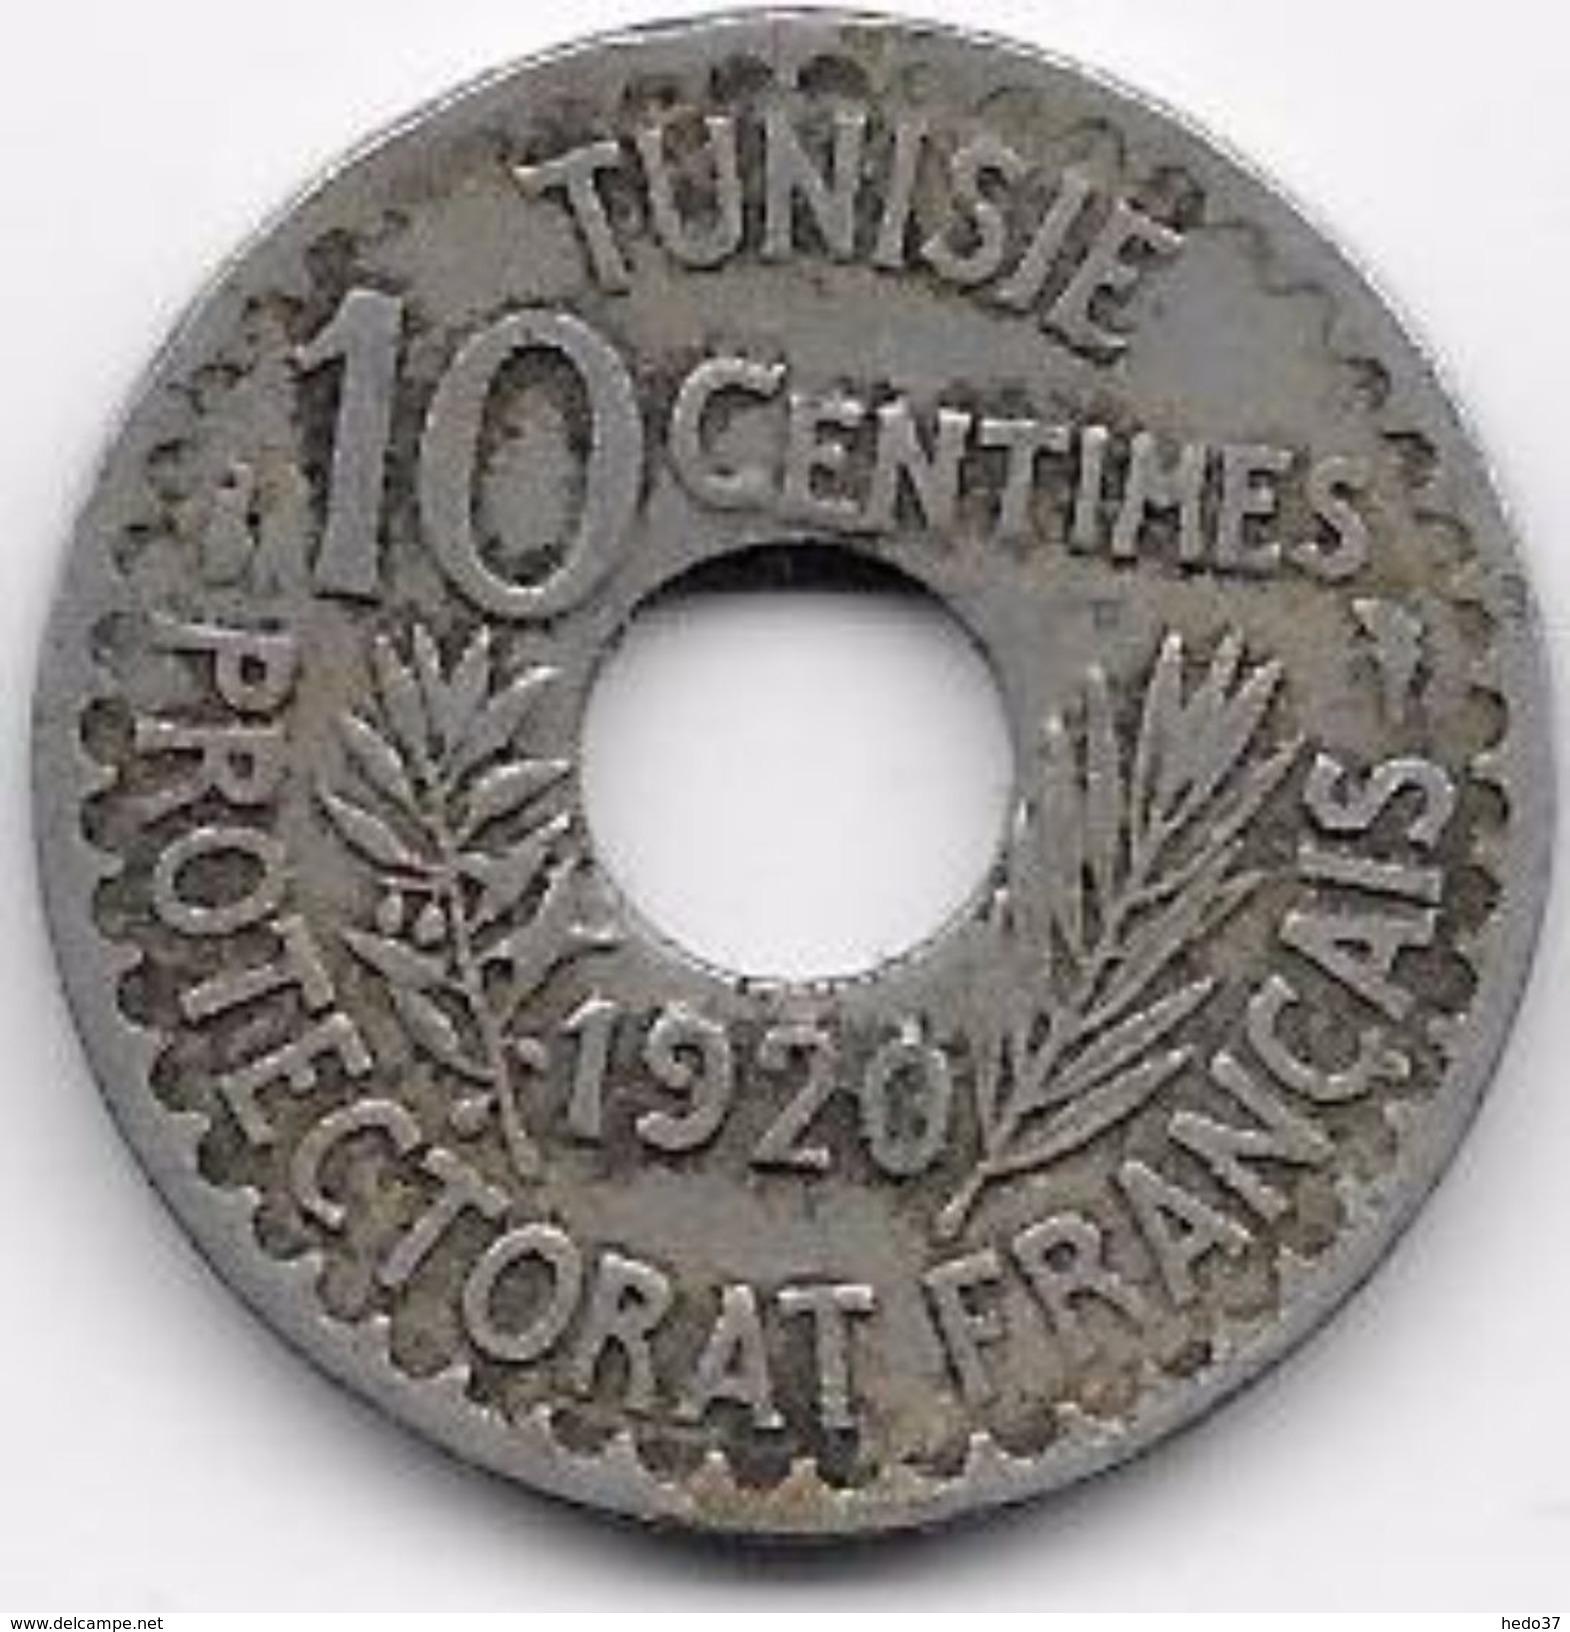 Tunisie 10 Centimes 1920 - Monnaies